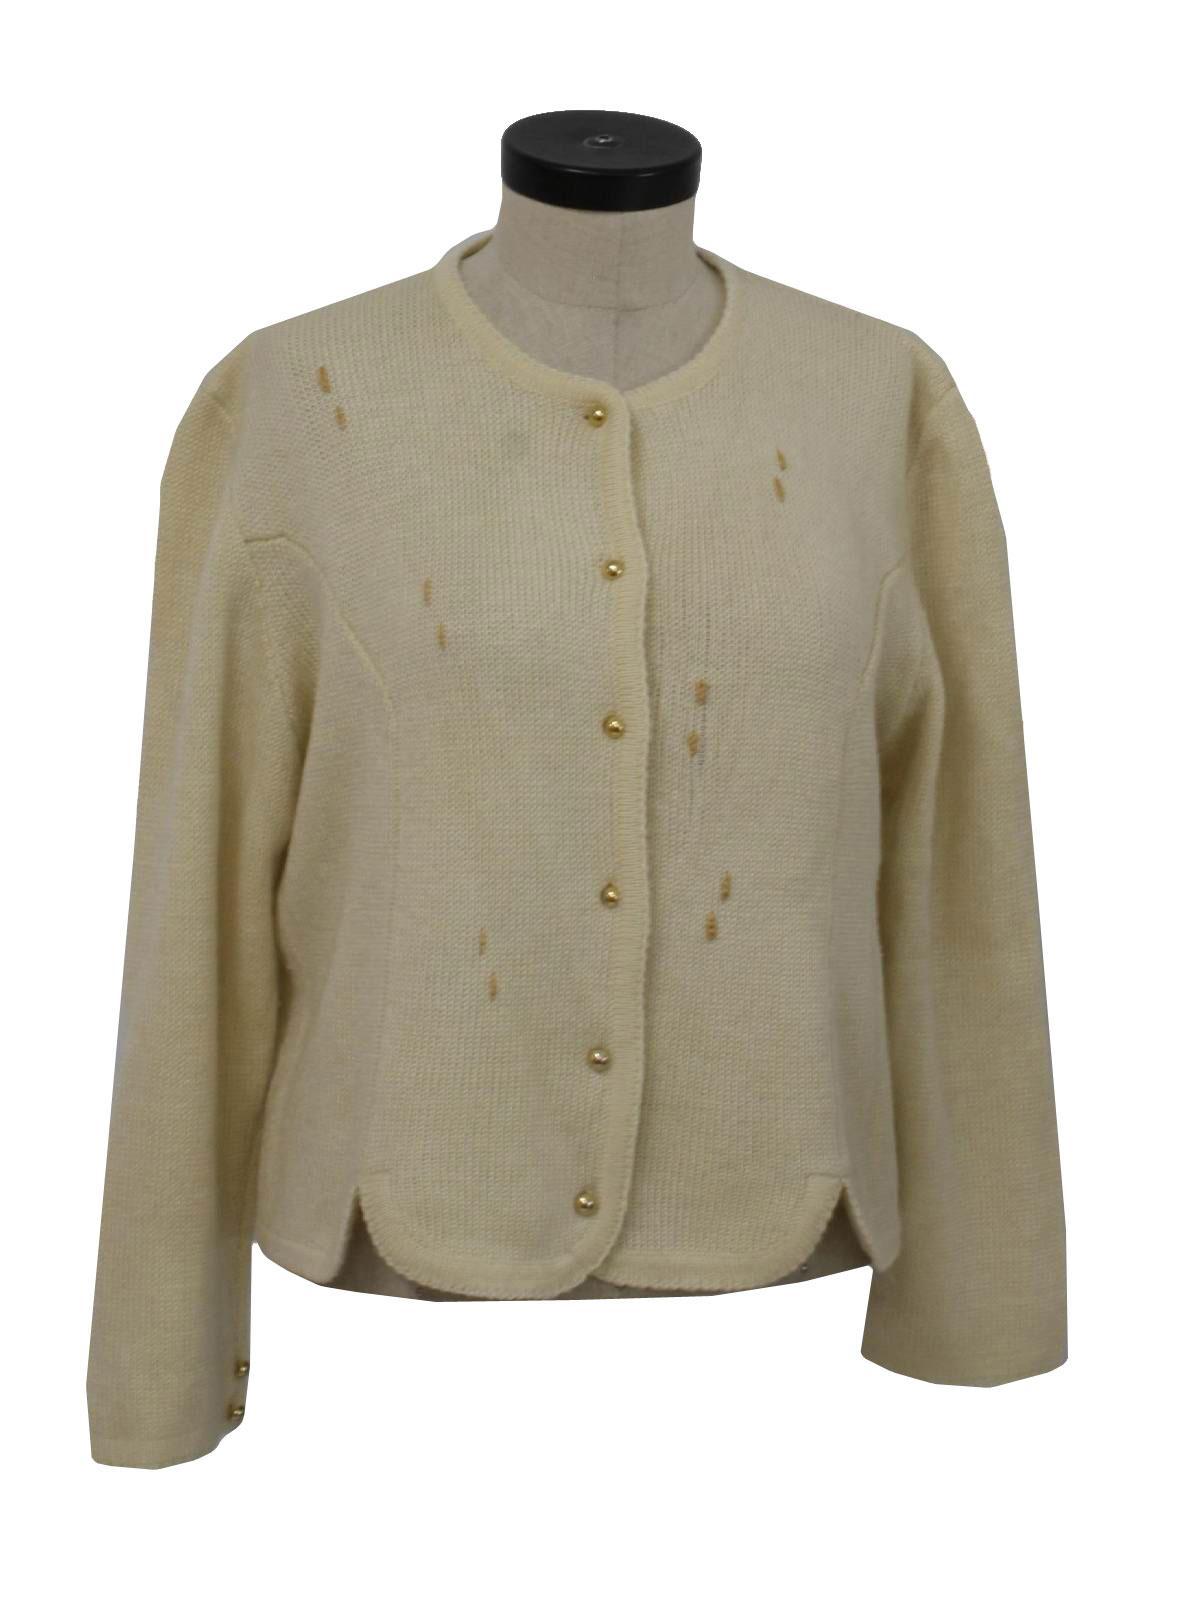 Vintage Baszio Eighties Sweater: 80s -Baszio- Womens off white ...